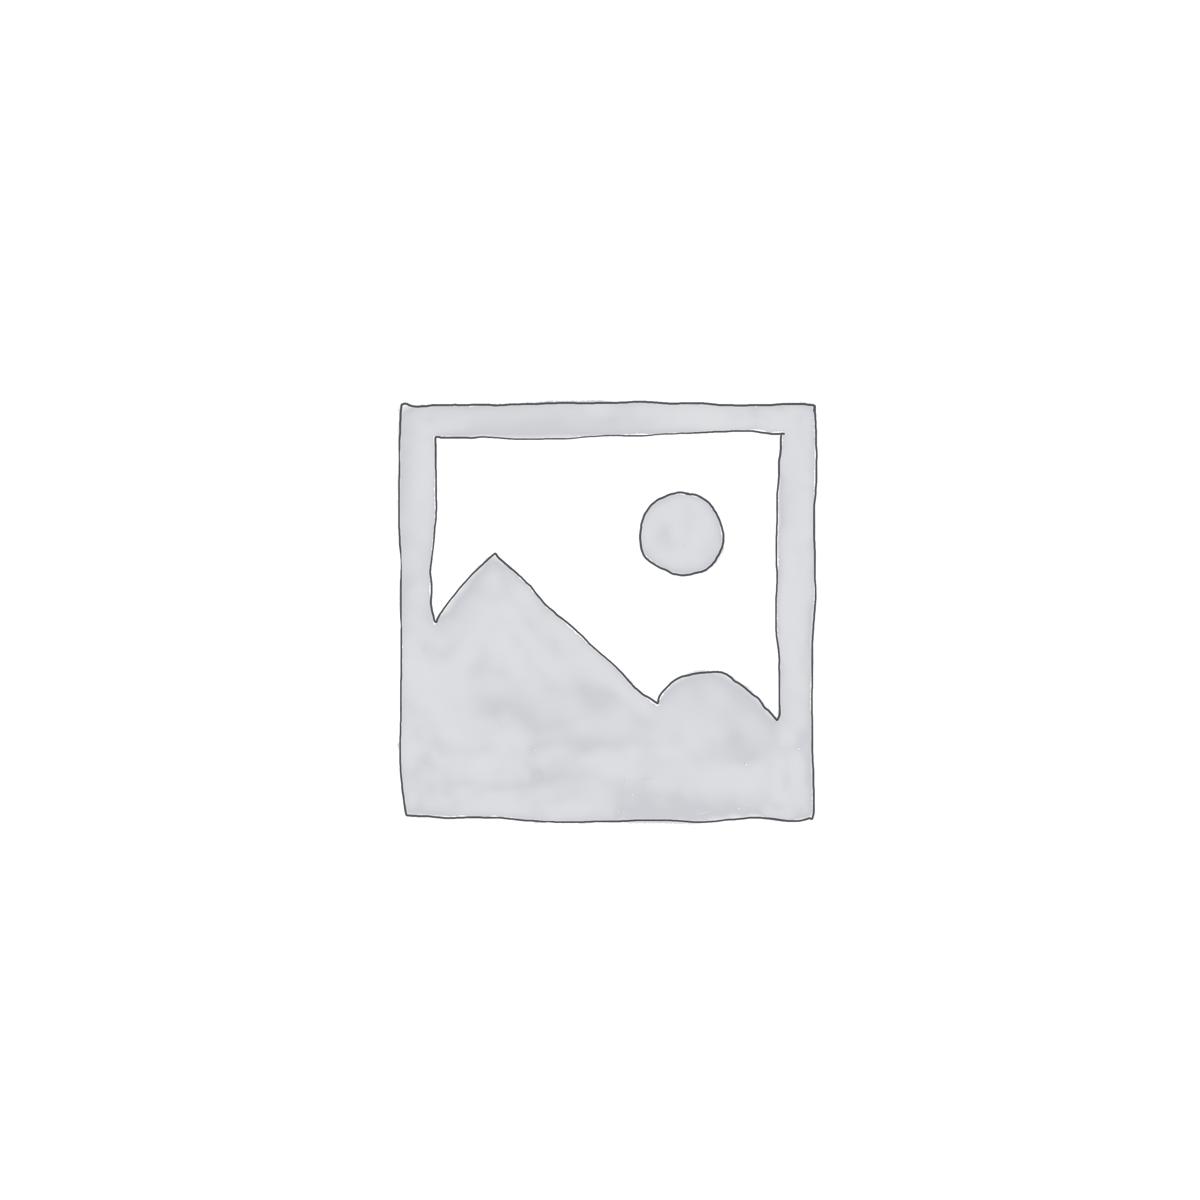 Доска планер магнитный на МЕСЯЦ 90х60см, рамке ALU23